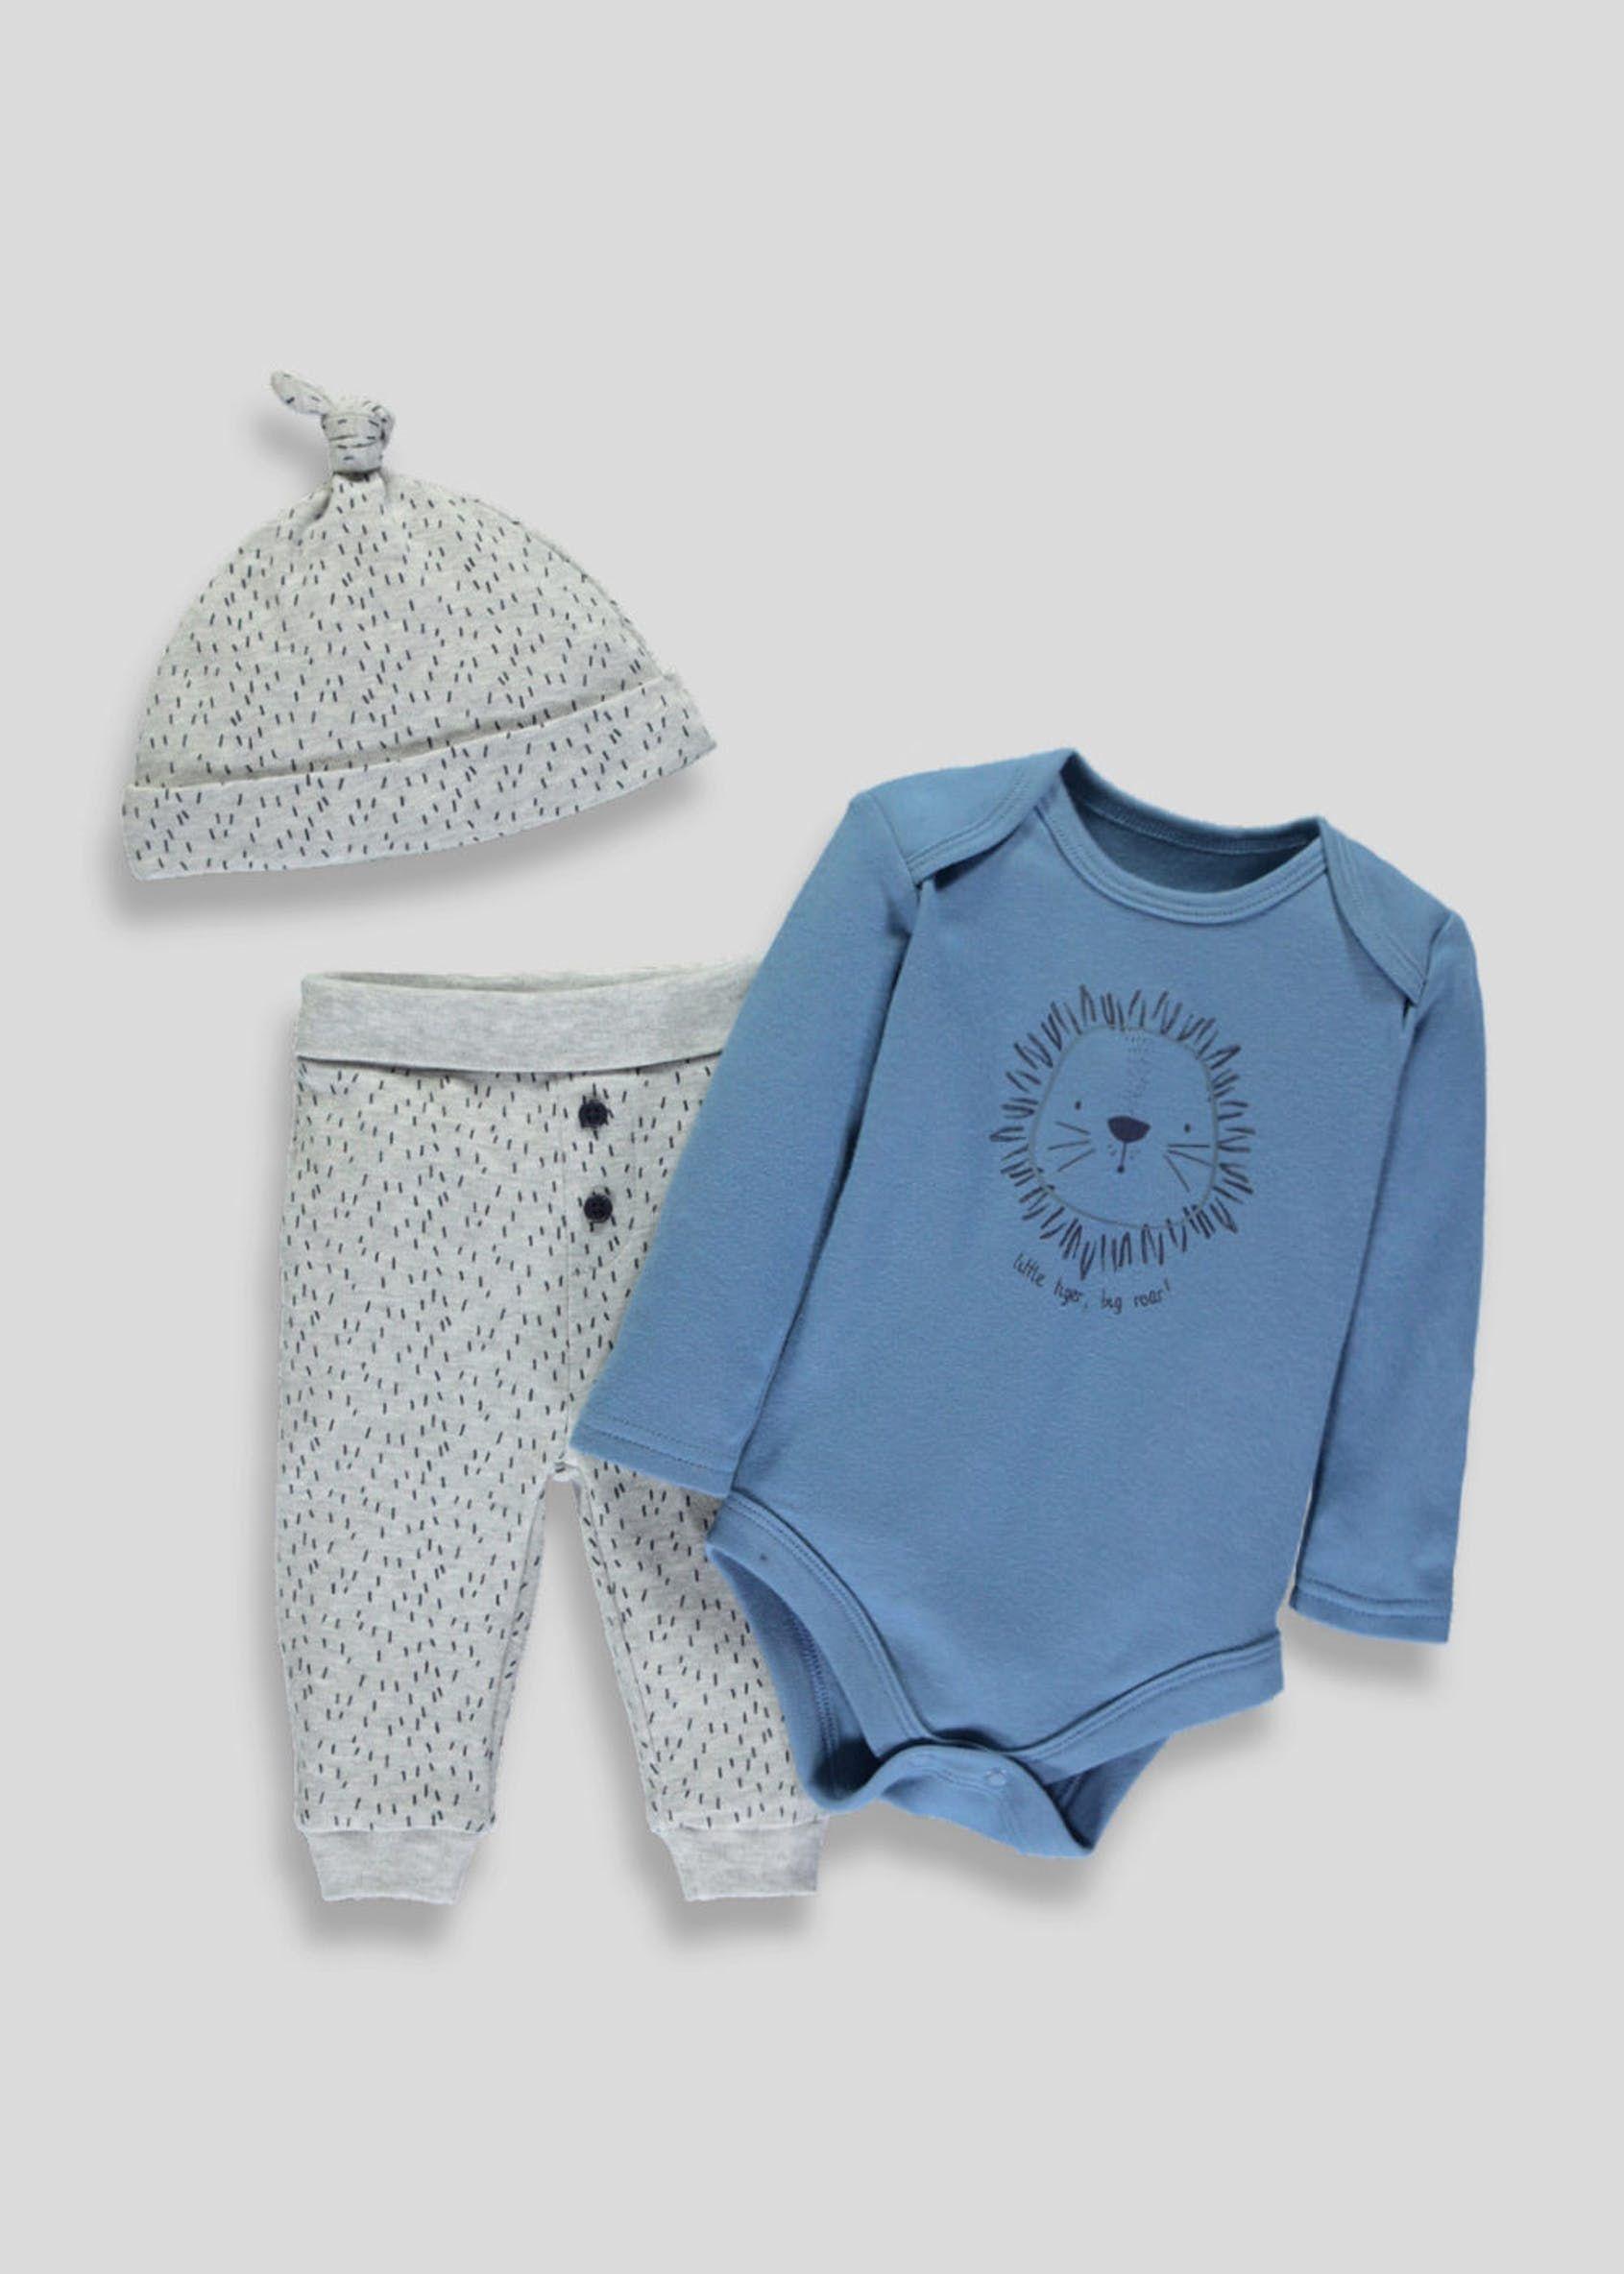 6be9bc85f51f6 Unisex Lion Bodysuit, Leggings & Heat Set (Tiny Baby-9mths) – Navy ...